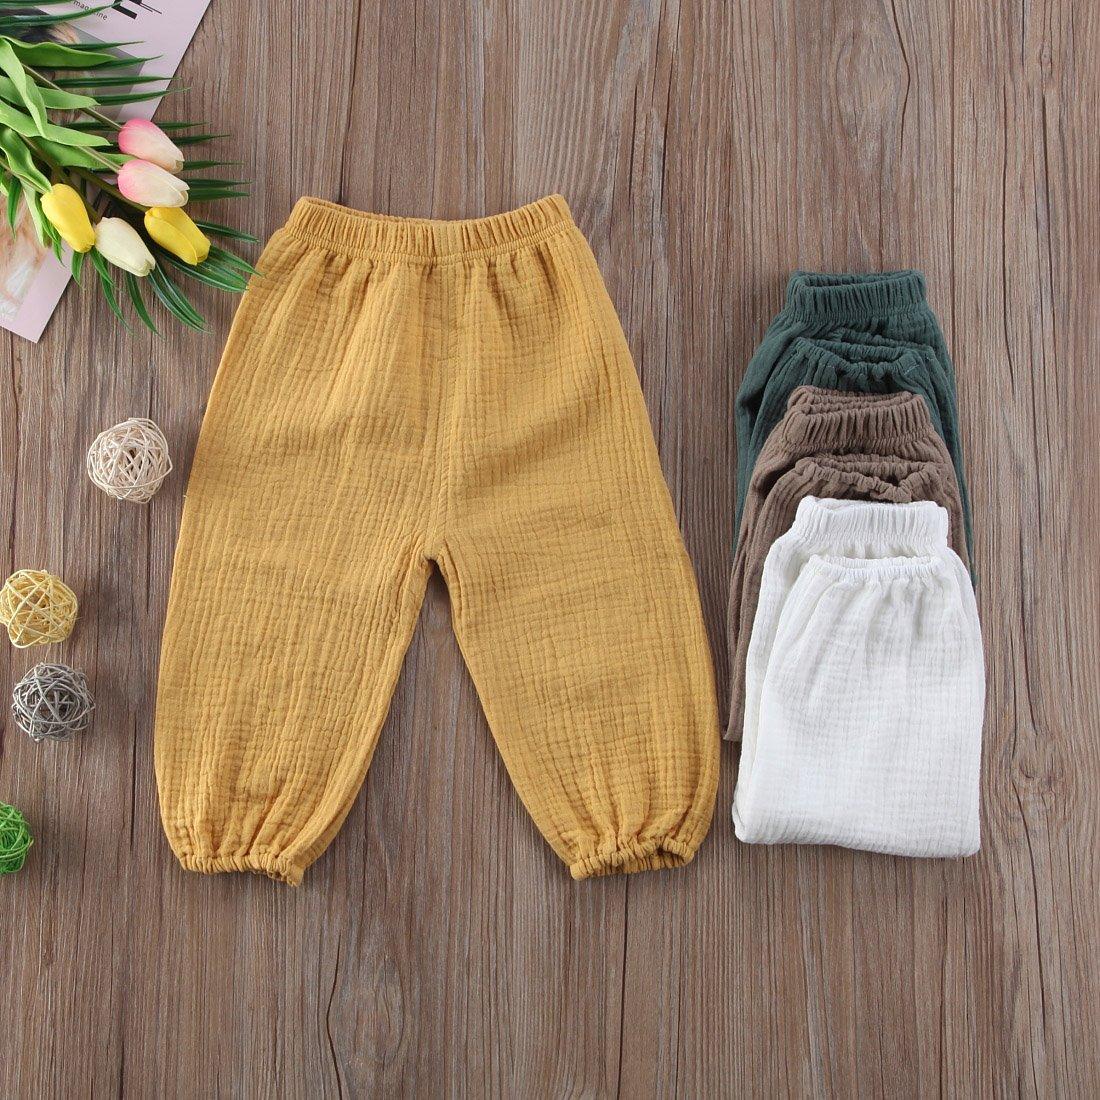 BULINGNA Cute Toddler Kids Baby Boy Girl Casual Eelastic Harem Long Pants Bloomers